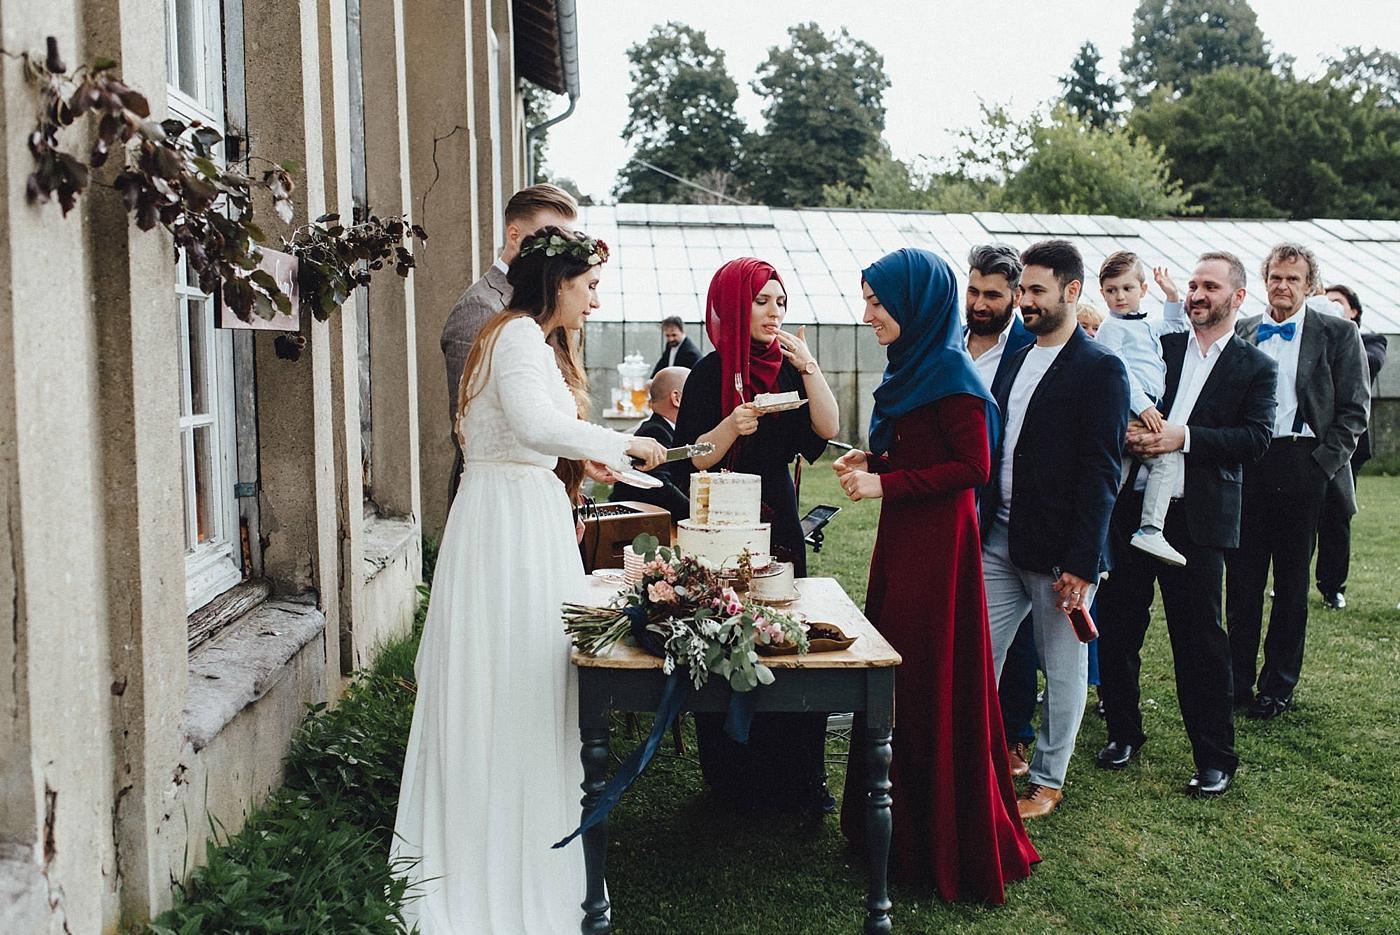 urban-elopement-wedding-167